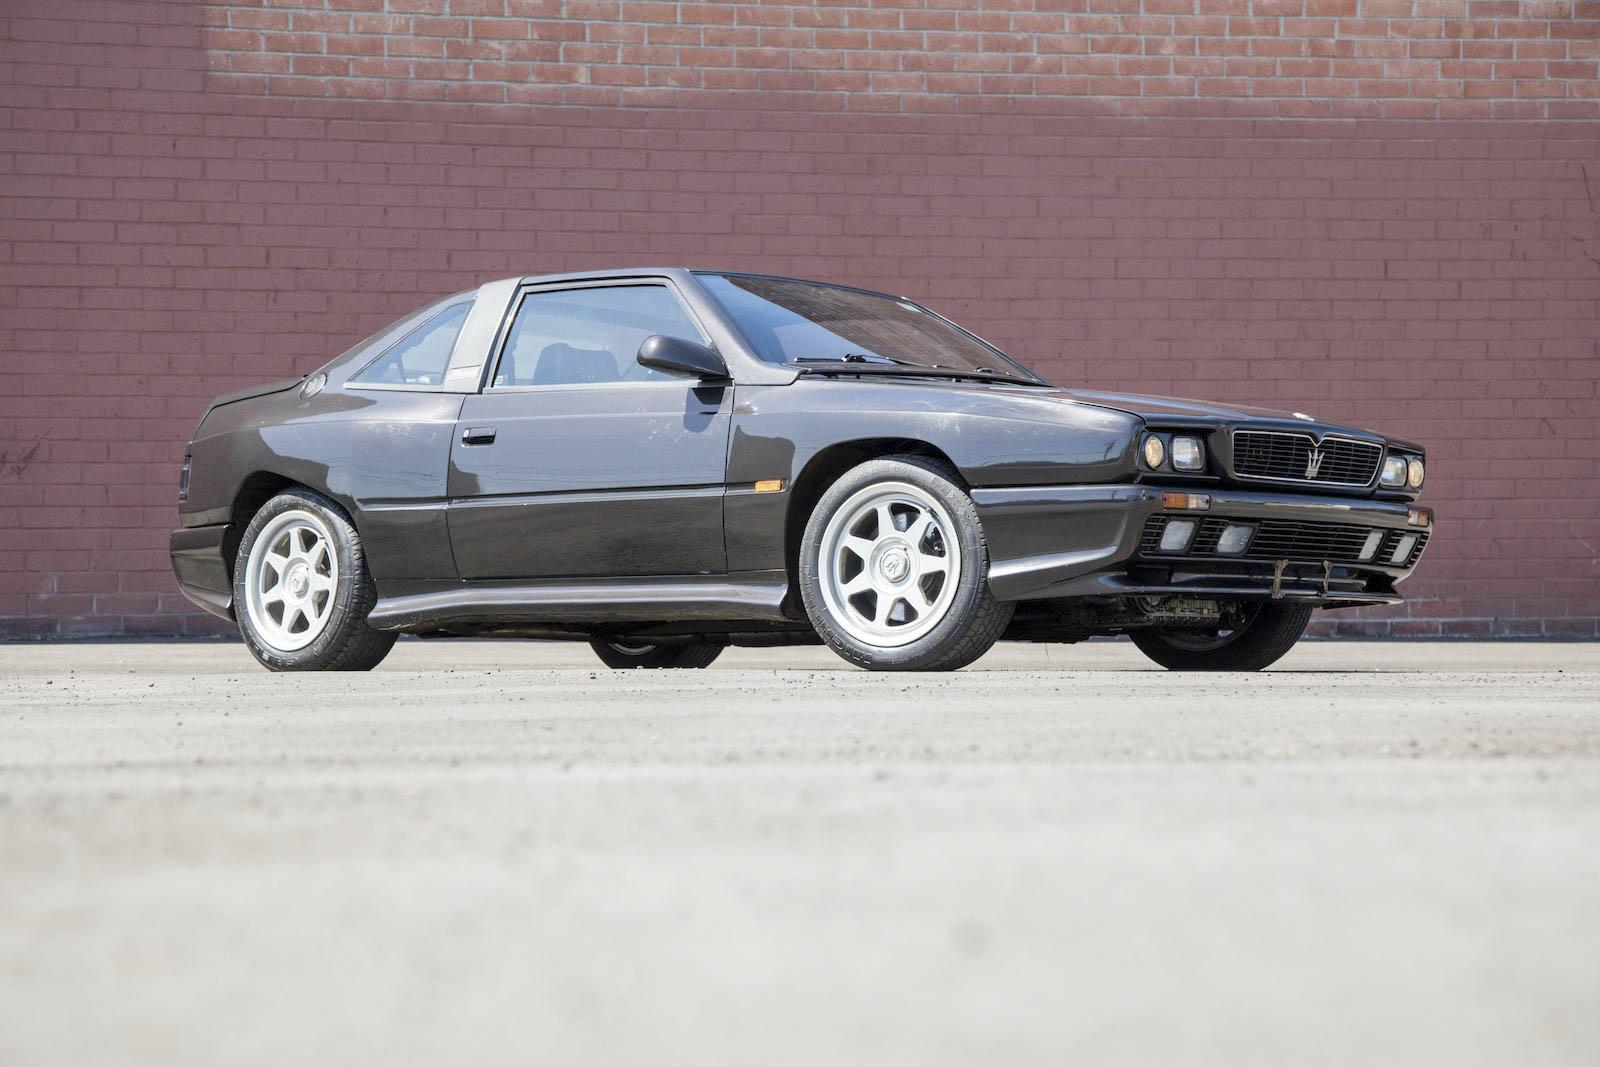 1990 Maserati Shamal